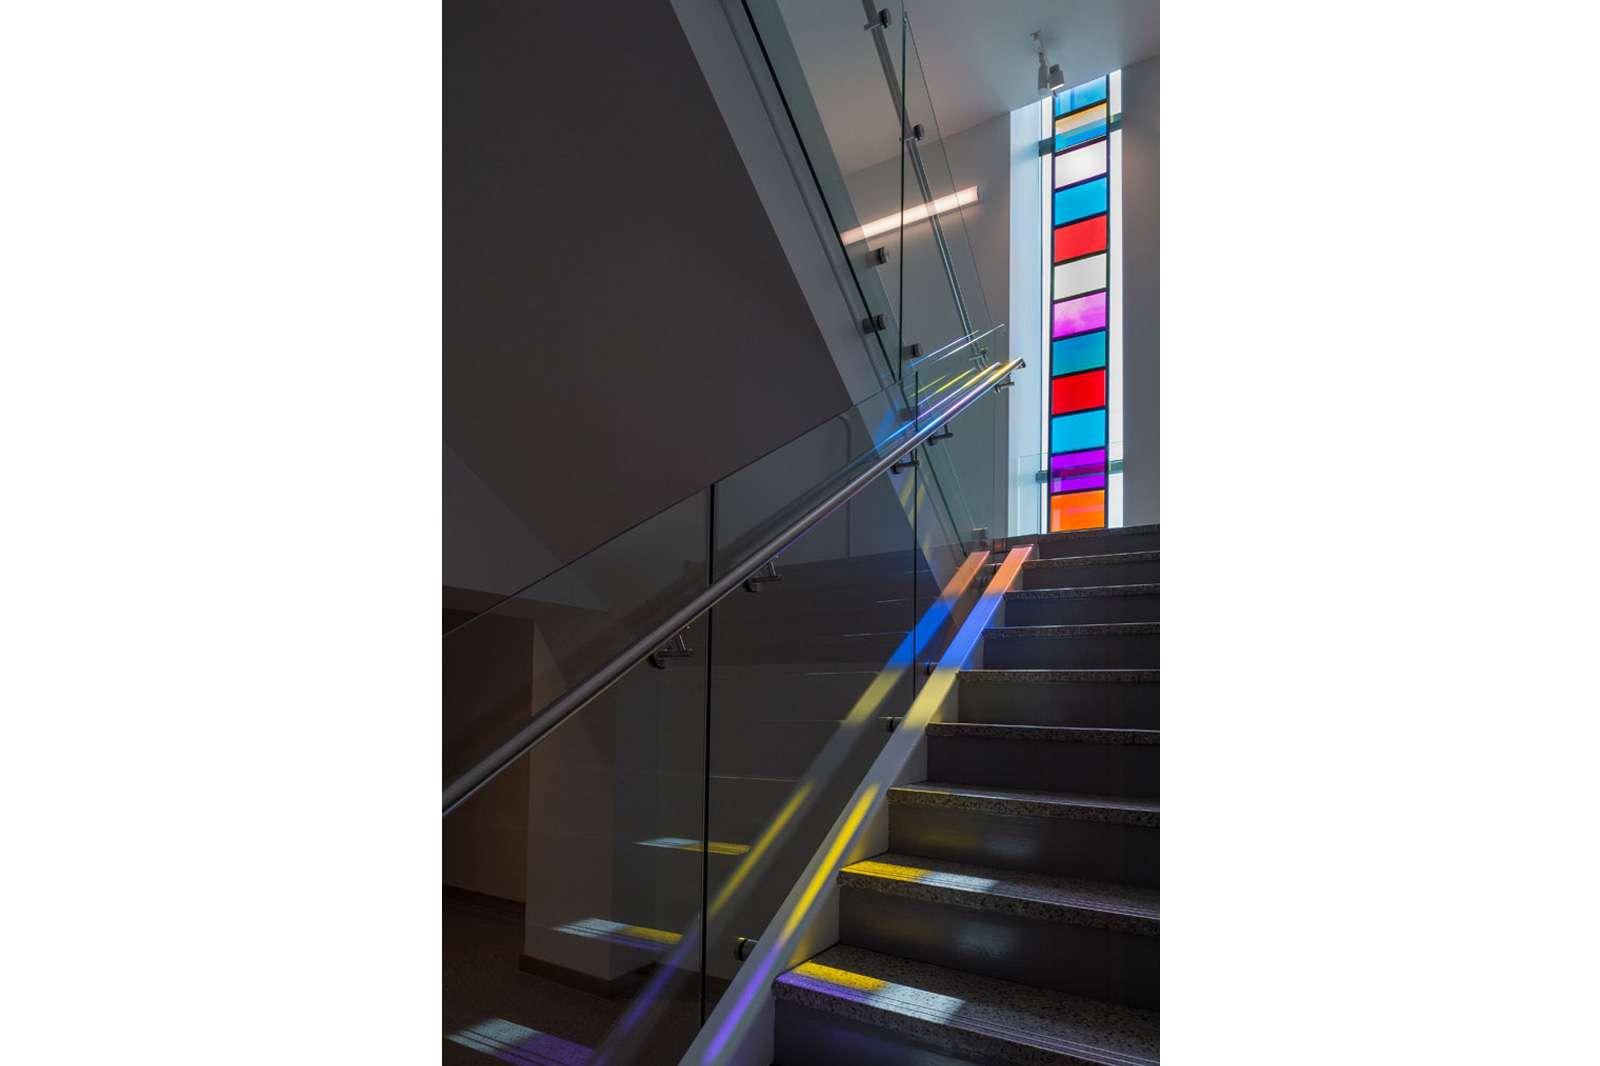 Stephen Dean, Ladder descending a staircase, 2014. Photo: Nash Baker